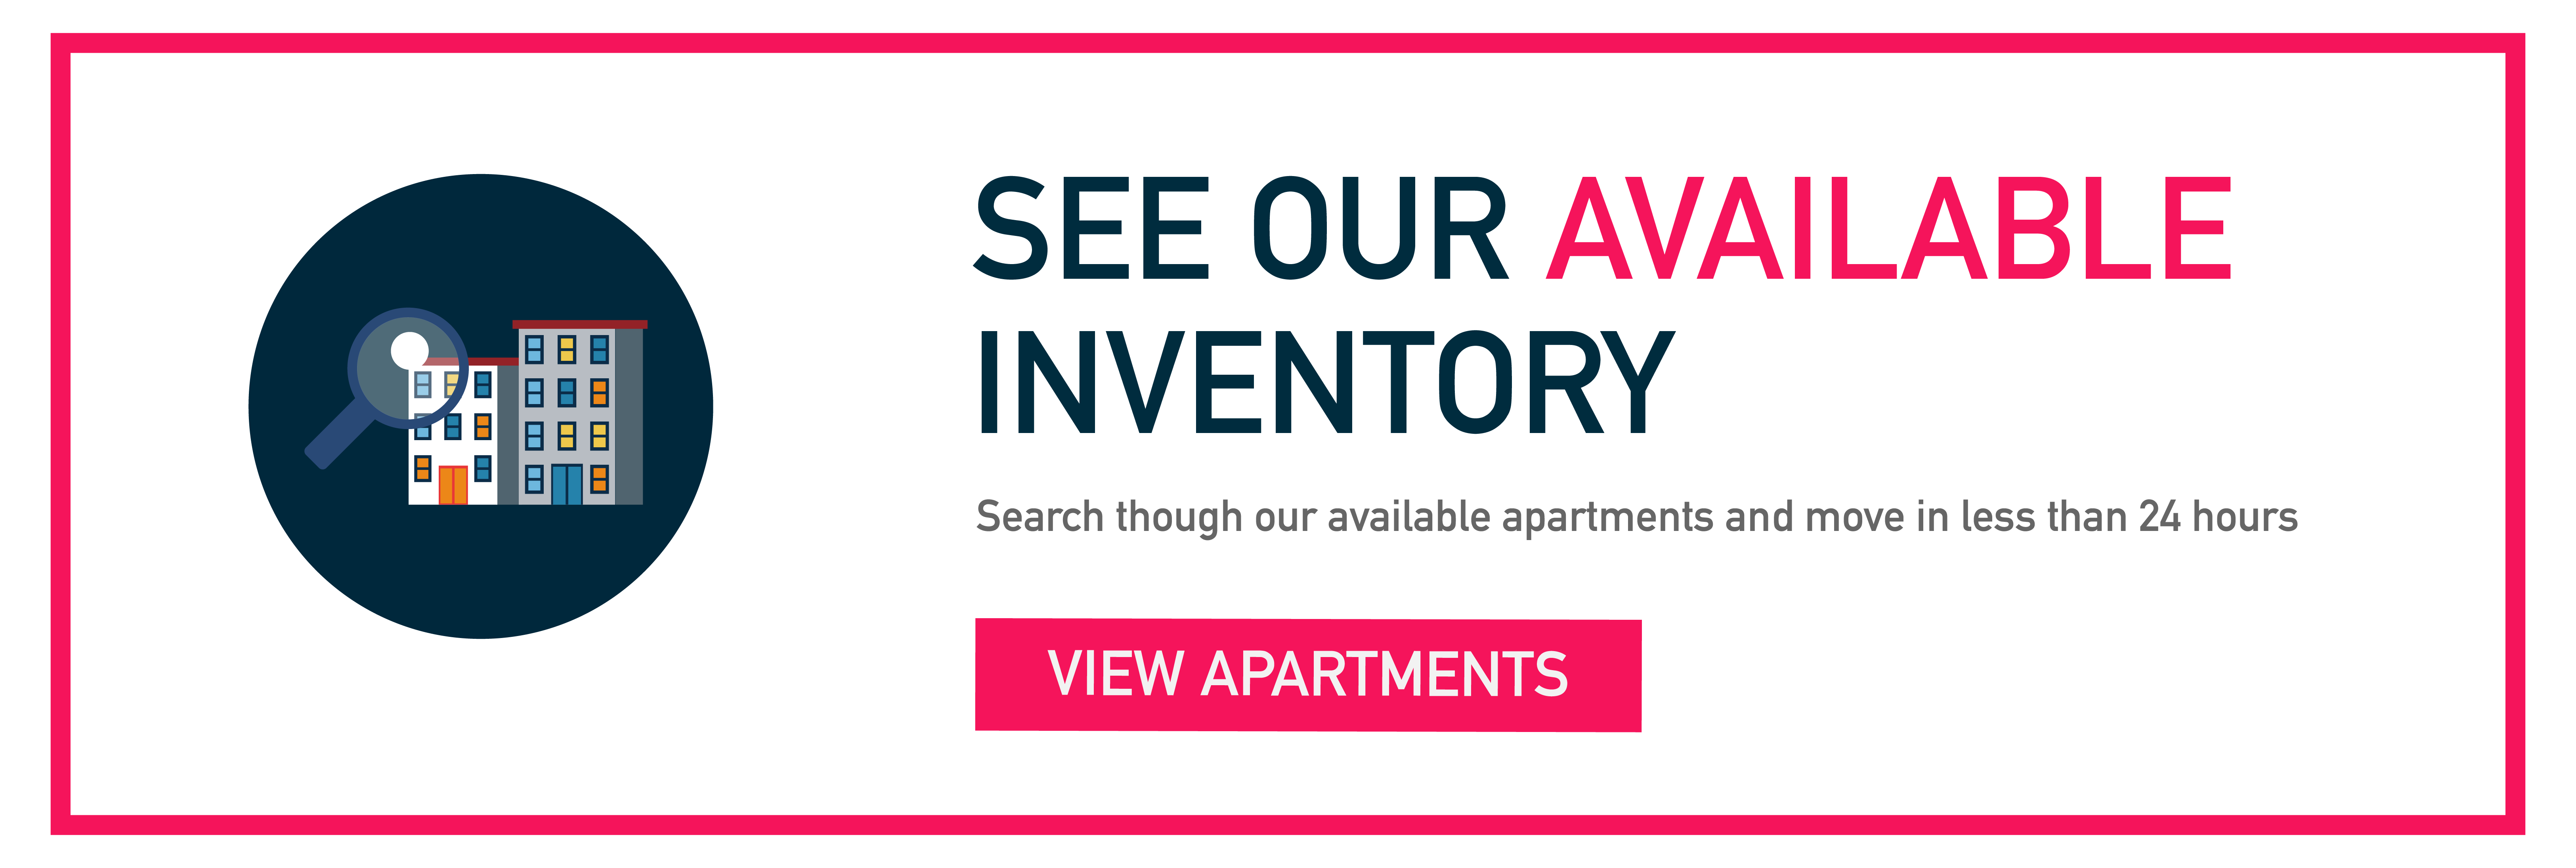 Inventory CTA-1